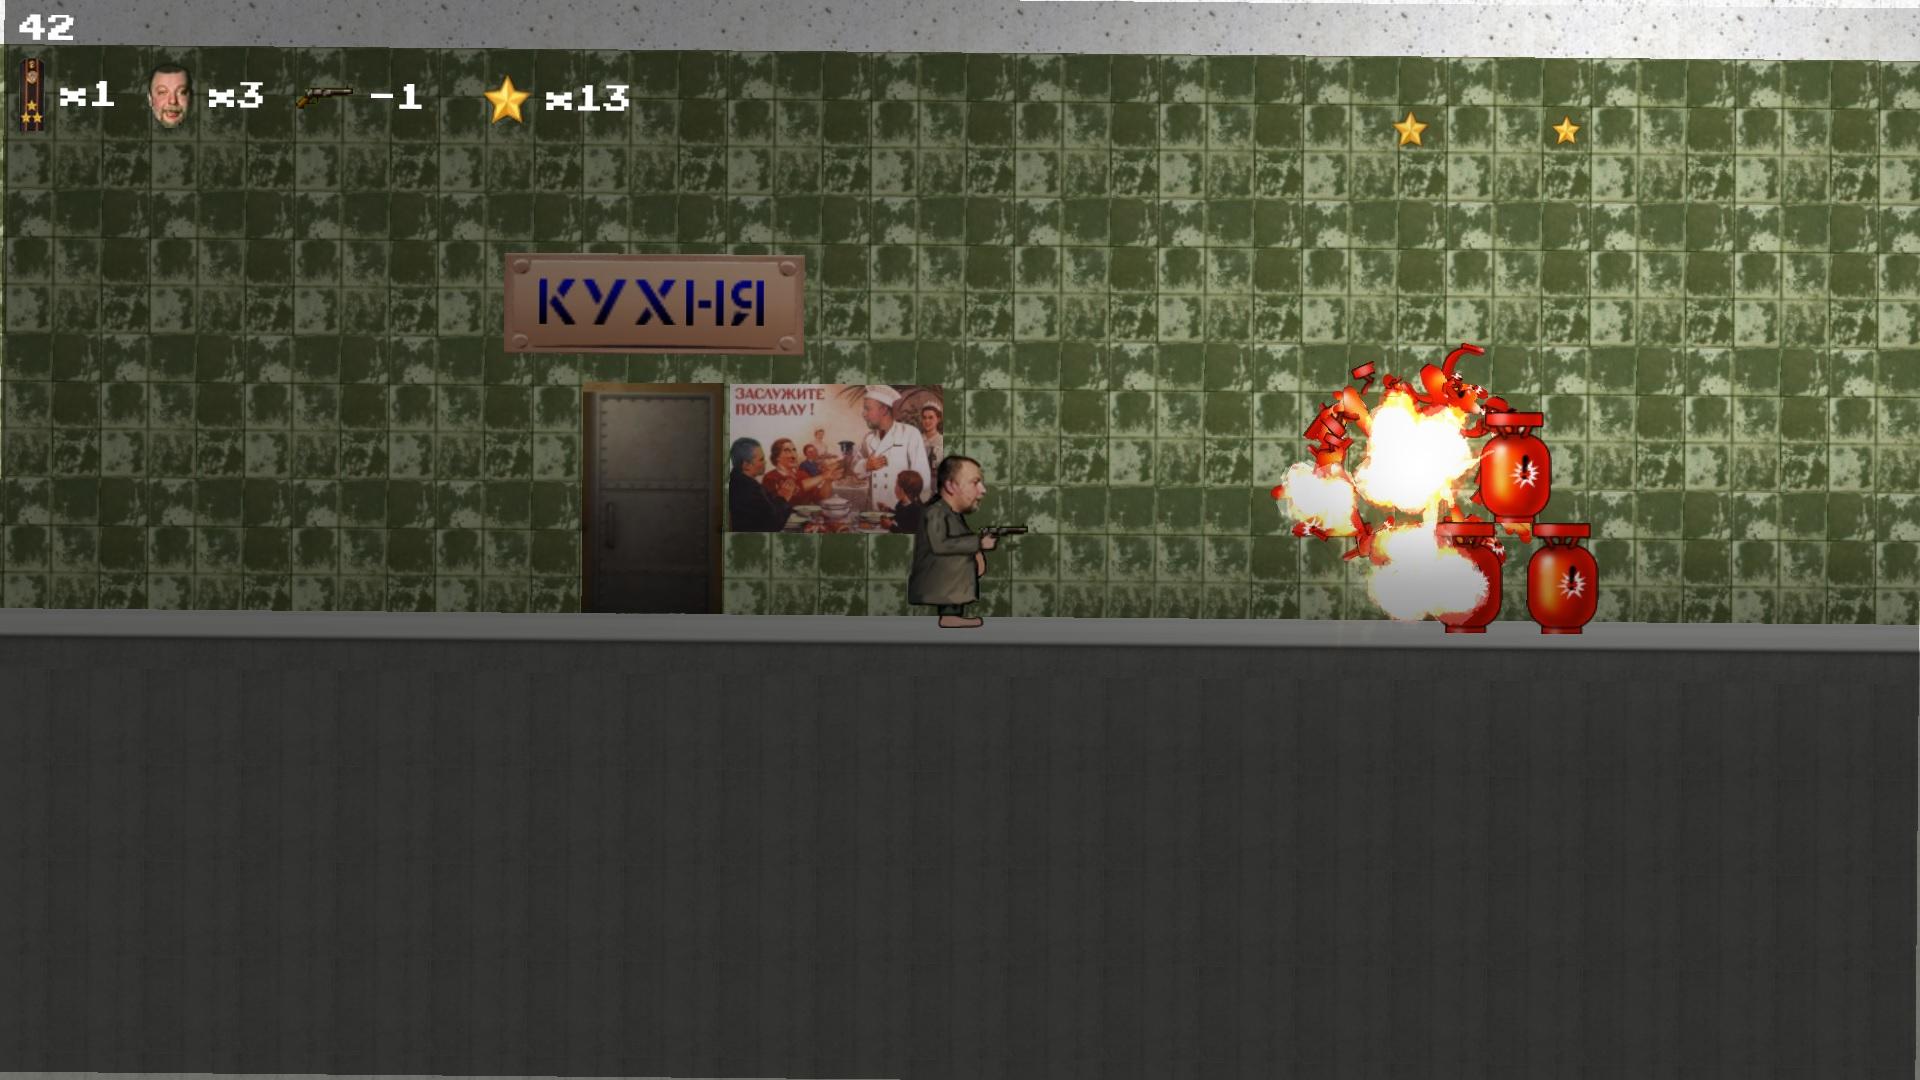 http://cdn.akamai.steamstatic.com/steam/apps/589770/ss_4287f1cc013b5cc73ebd1785c72d37b681d4bb71.1920x1080.jpg